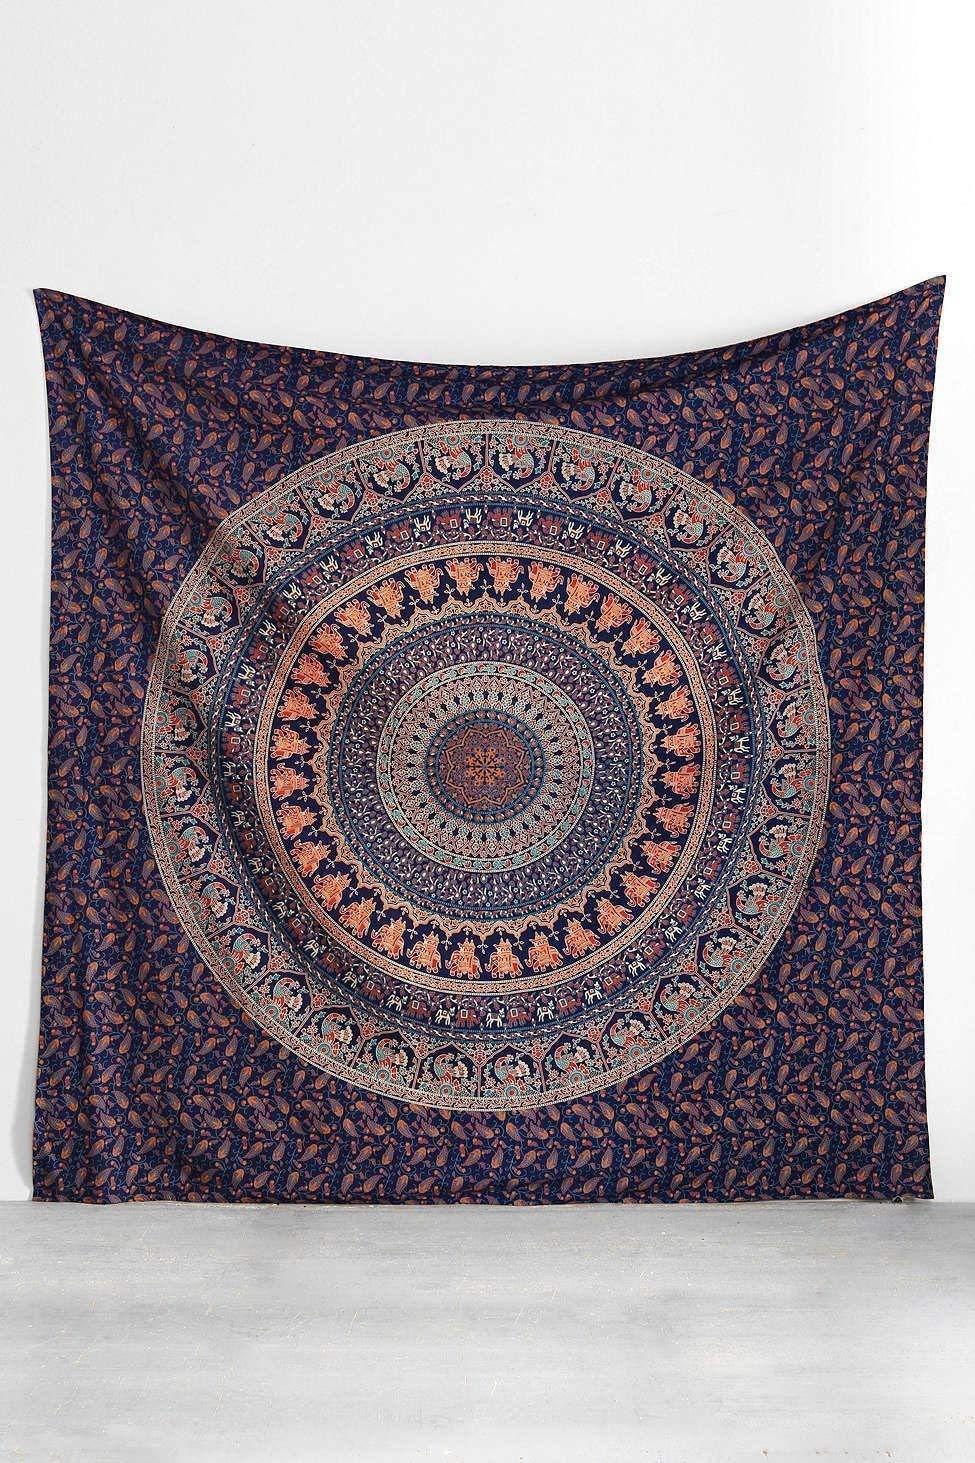 Handicraftofpinkcity White Color Hippie Mandala Tapestry Throw Queen Size Bohemian Decor Bedspread Blanket Indian Mandala Wall Hanging